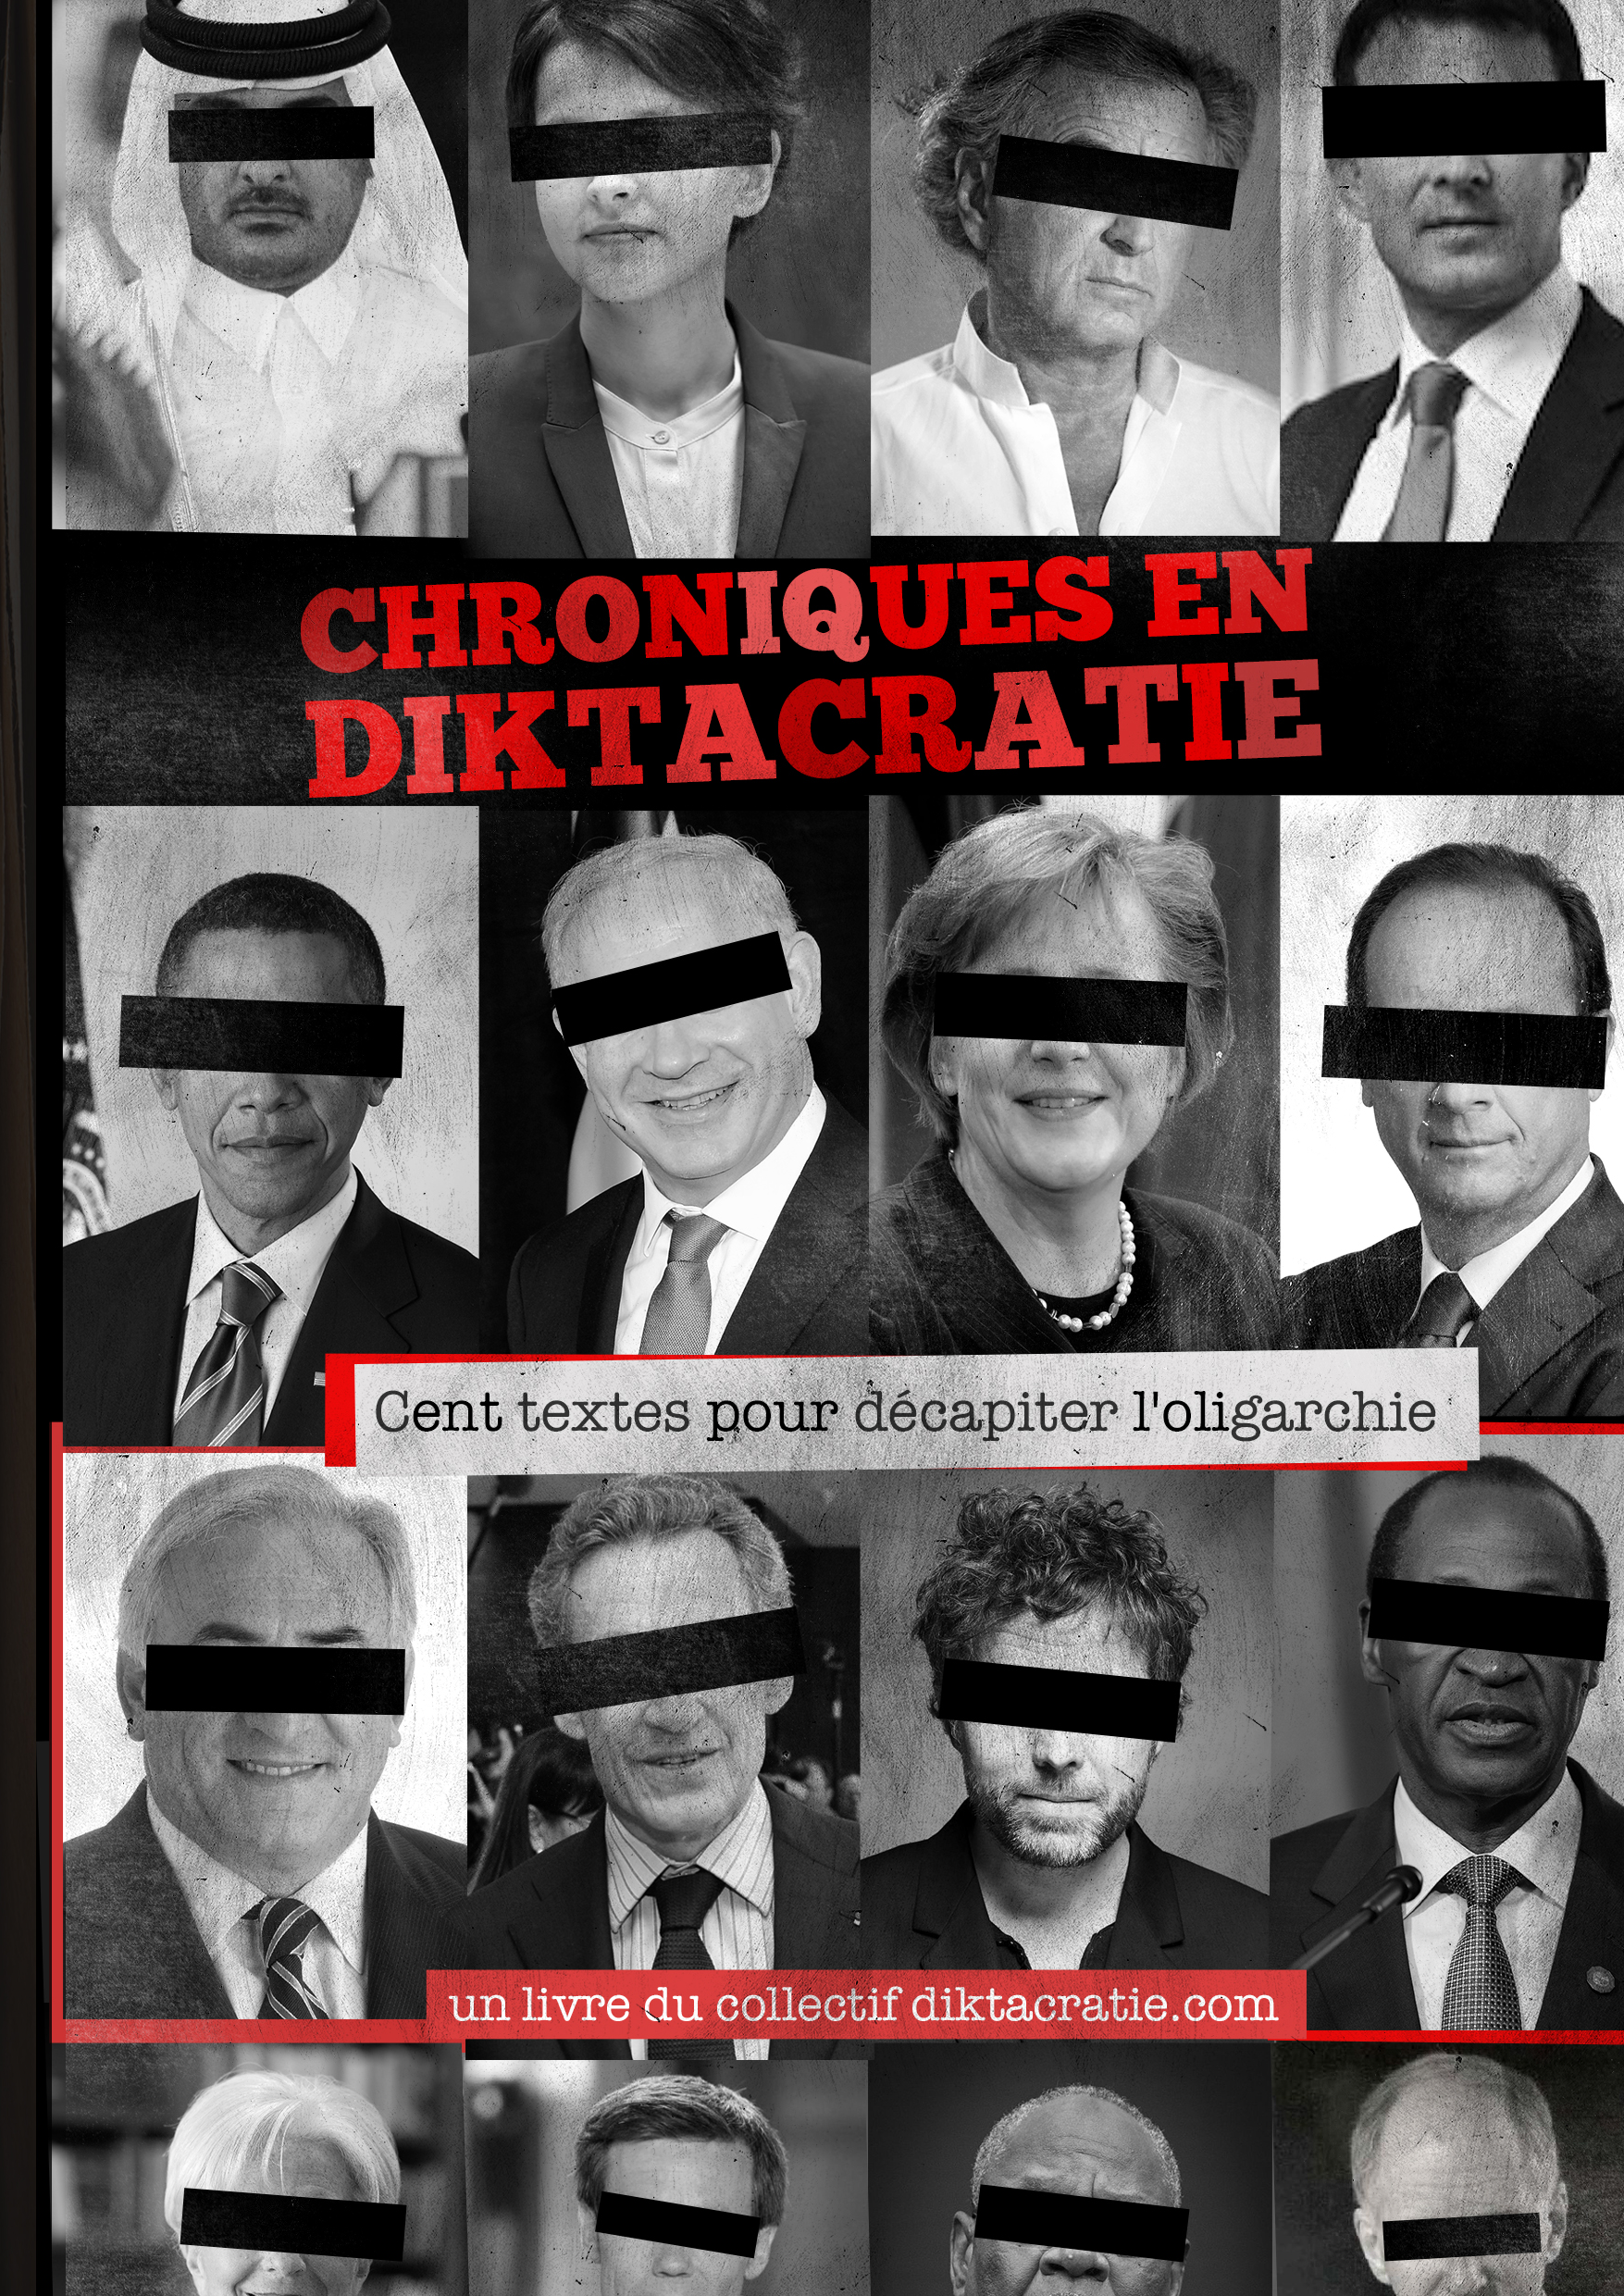 Chroniques en diktacratie